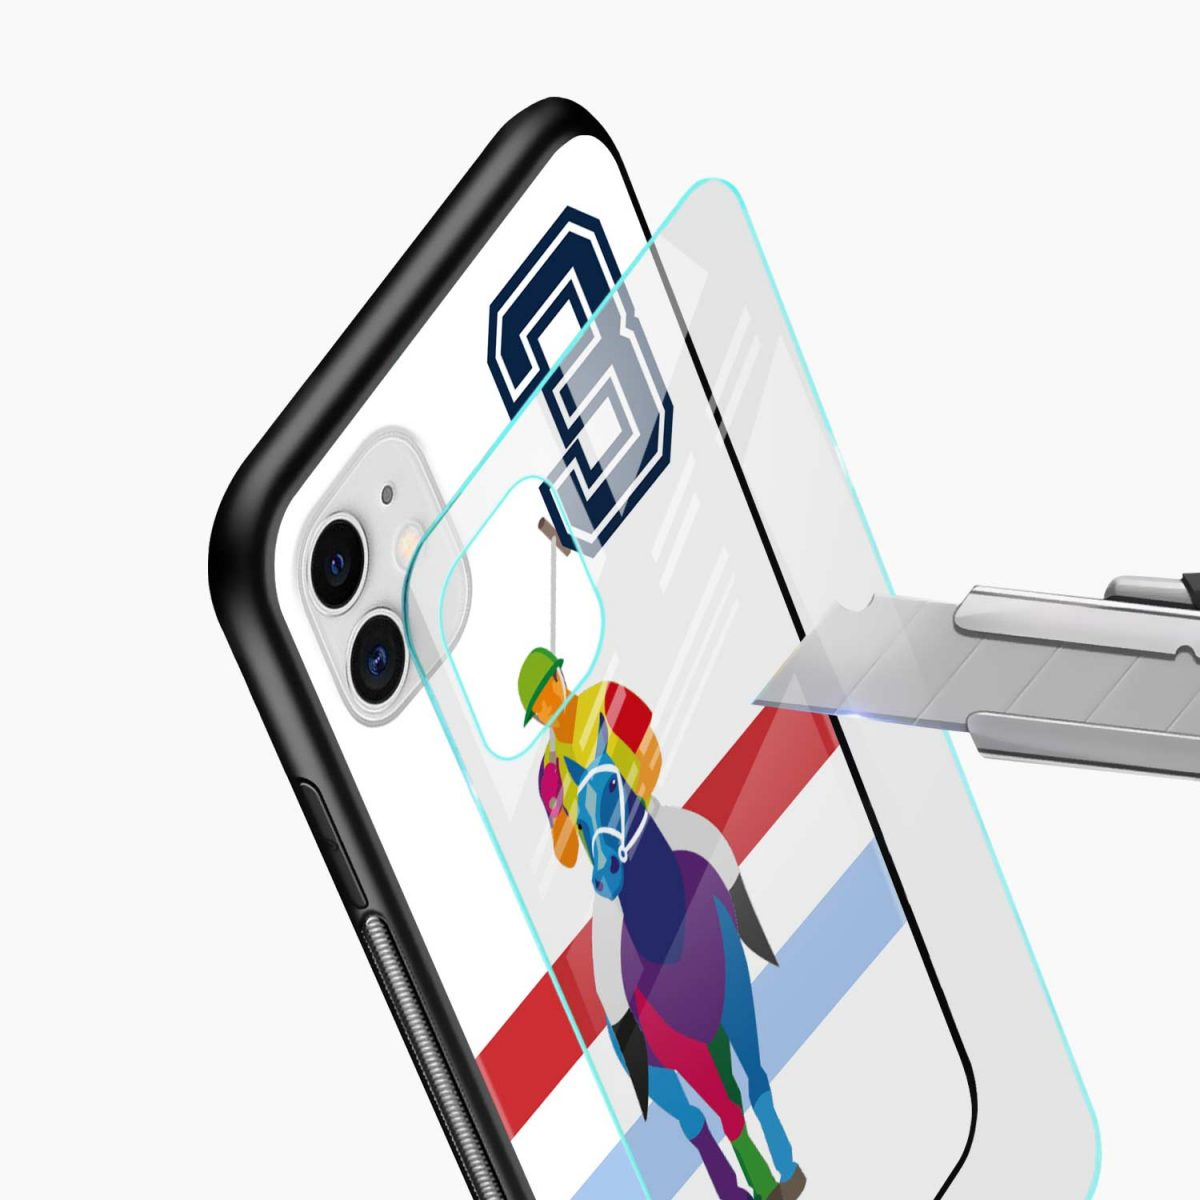 multicolor sant barbara polo iphone back cover glass view